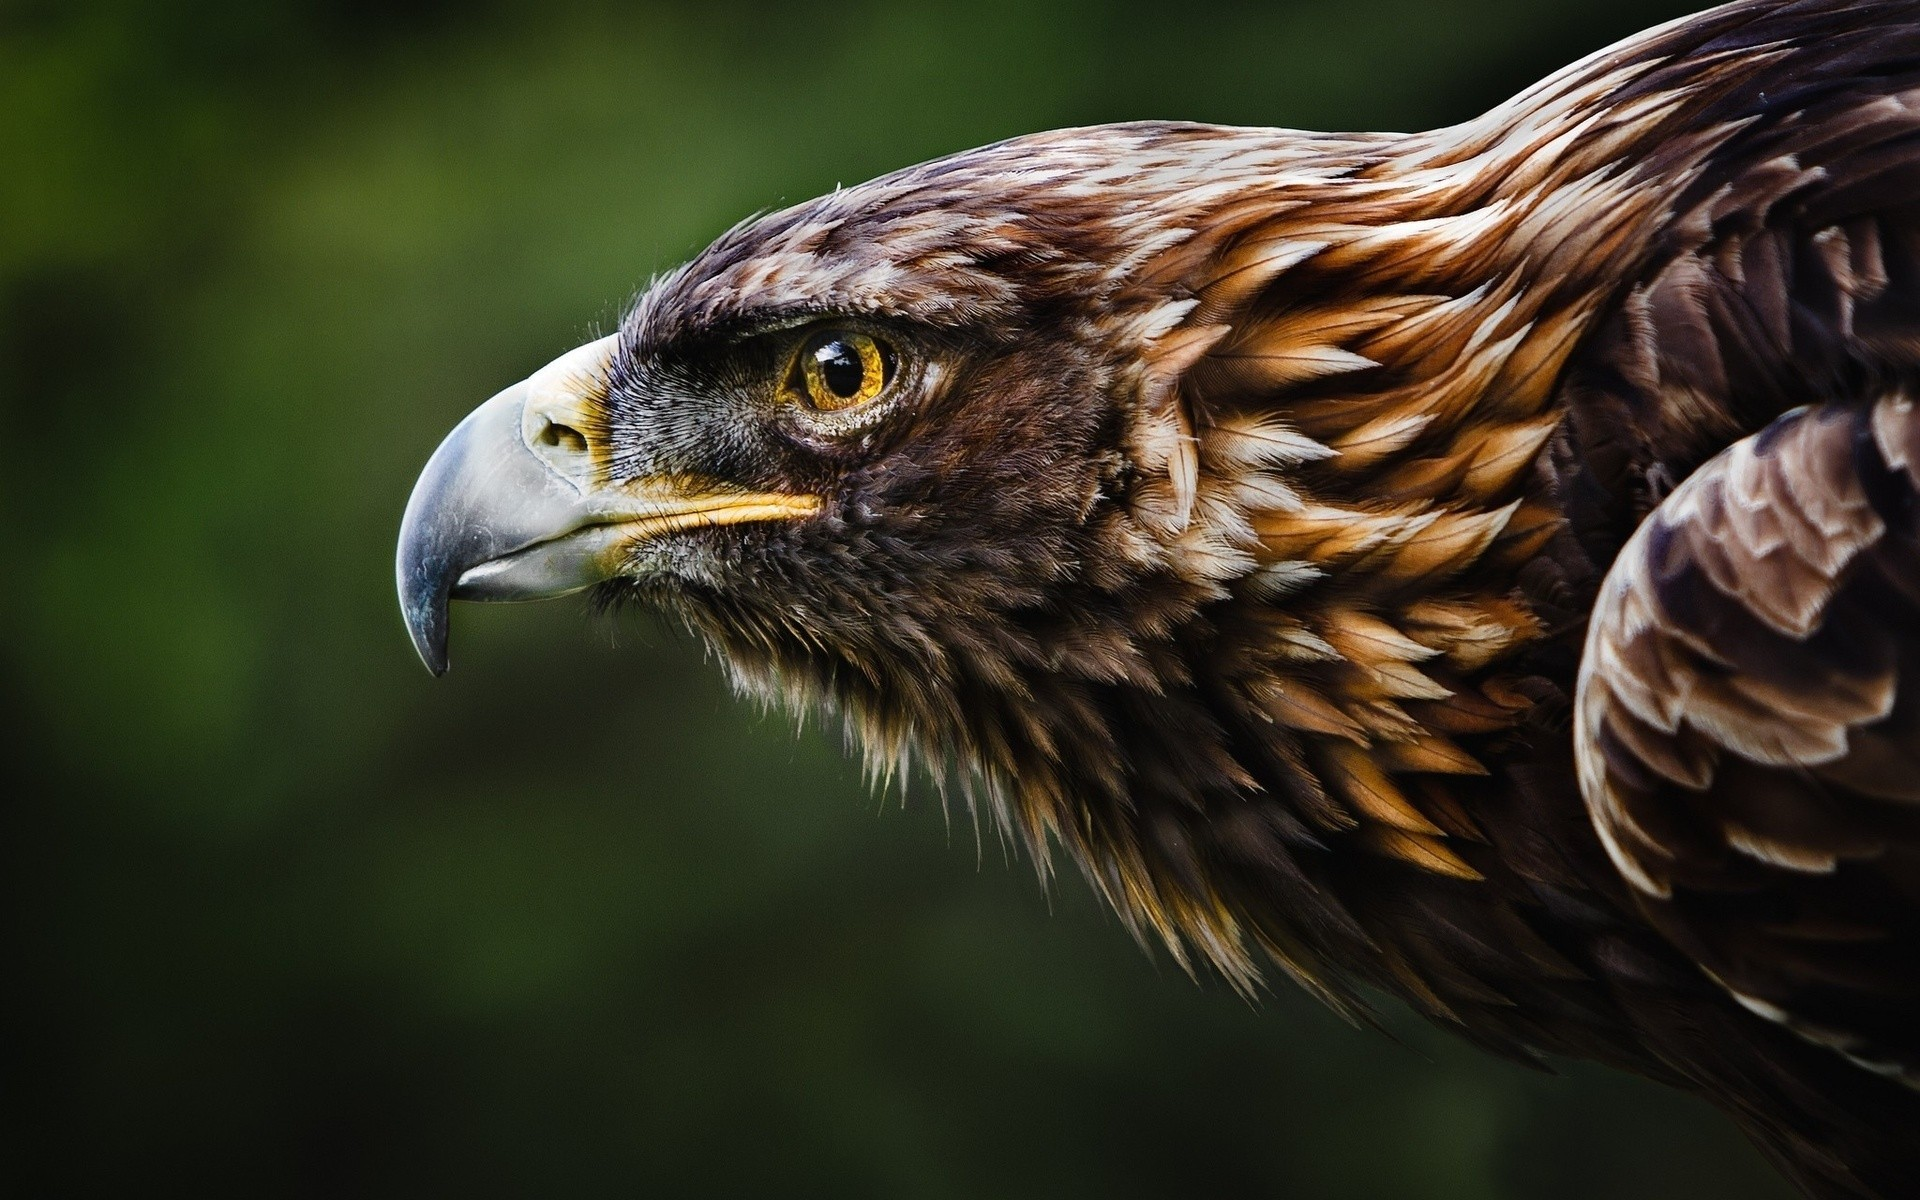 eagle animals birds nature